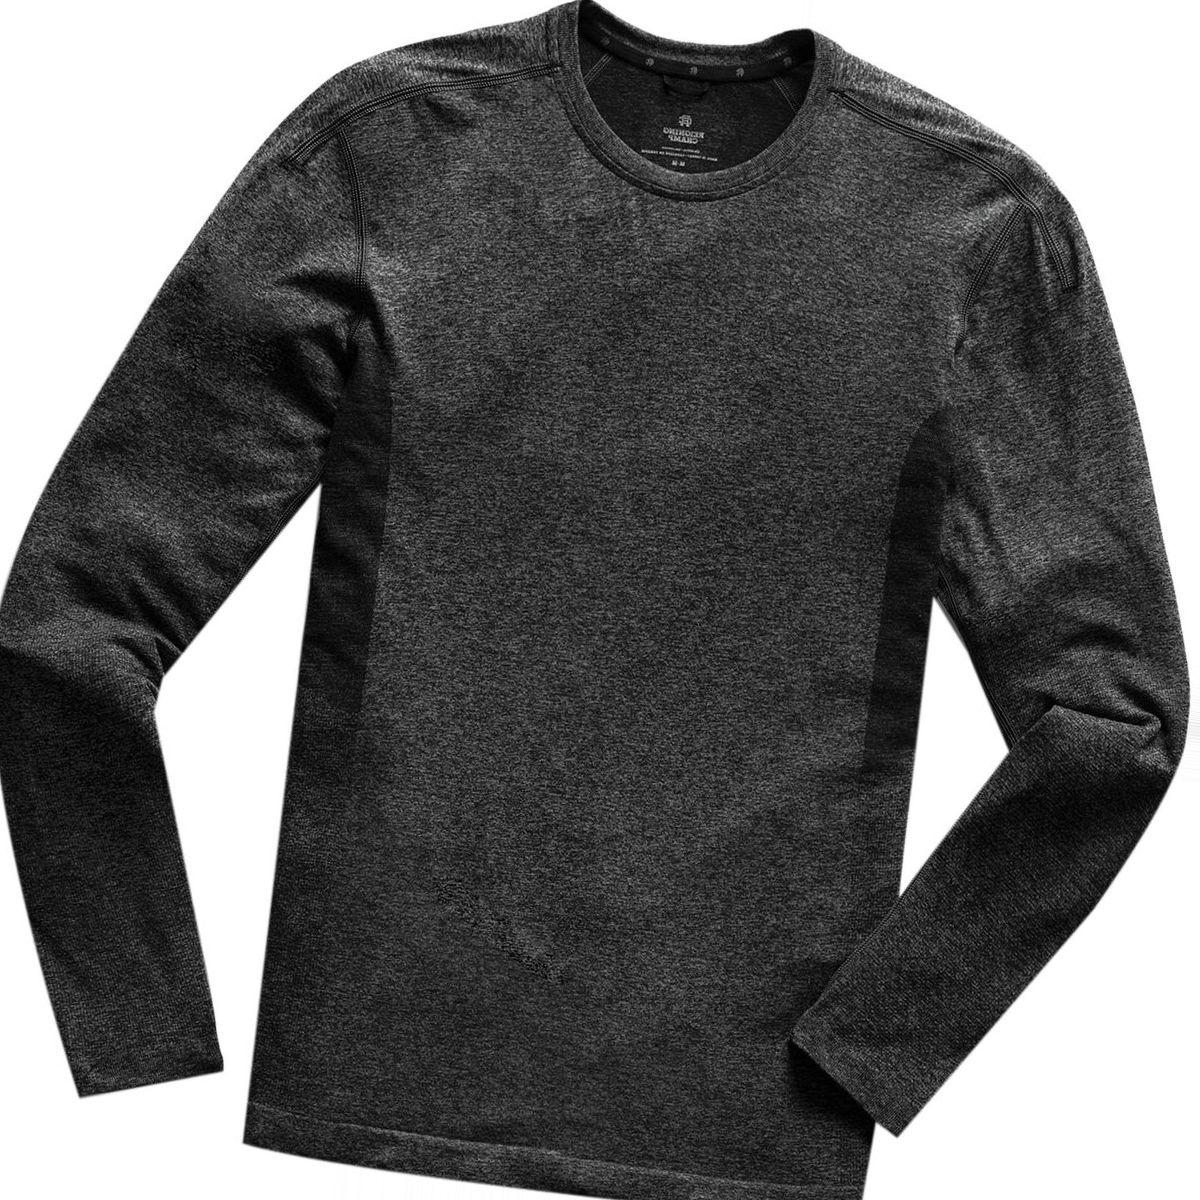 Reigning Champ Running Long-Sleeve T-Shirt - Men's